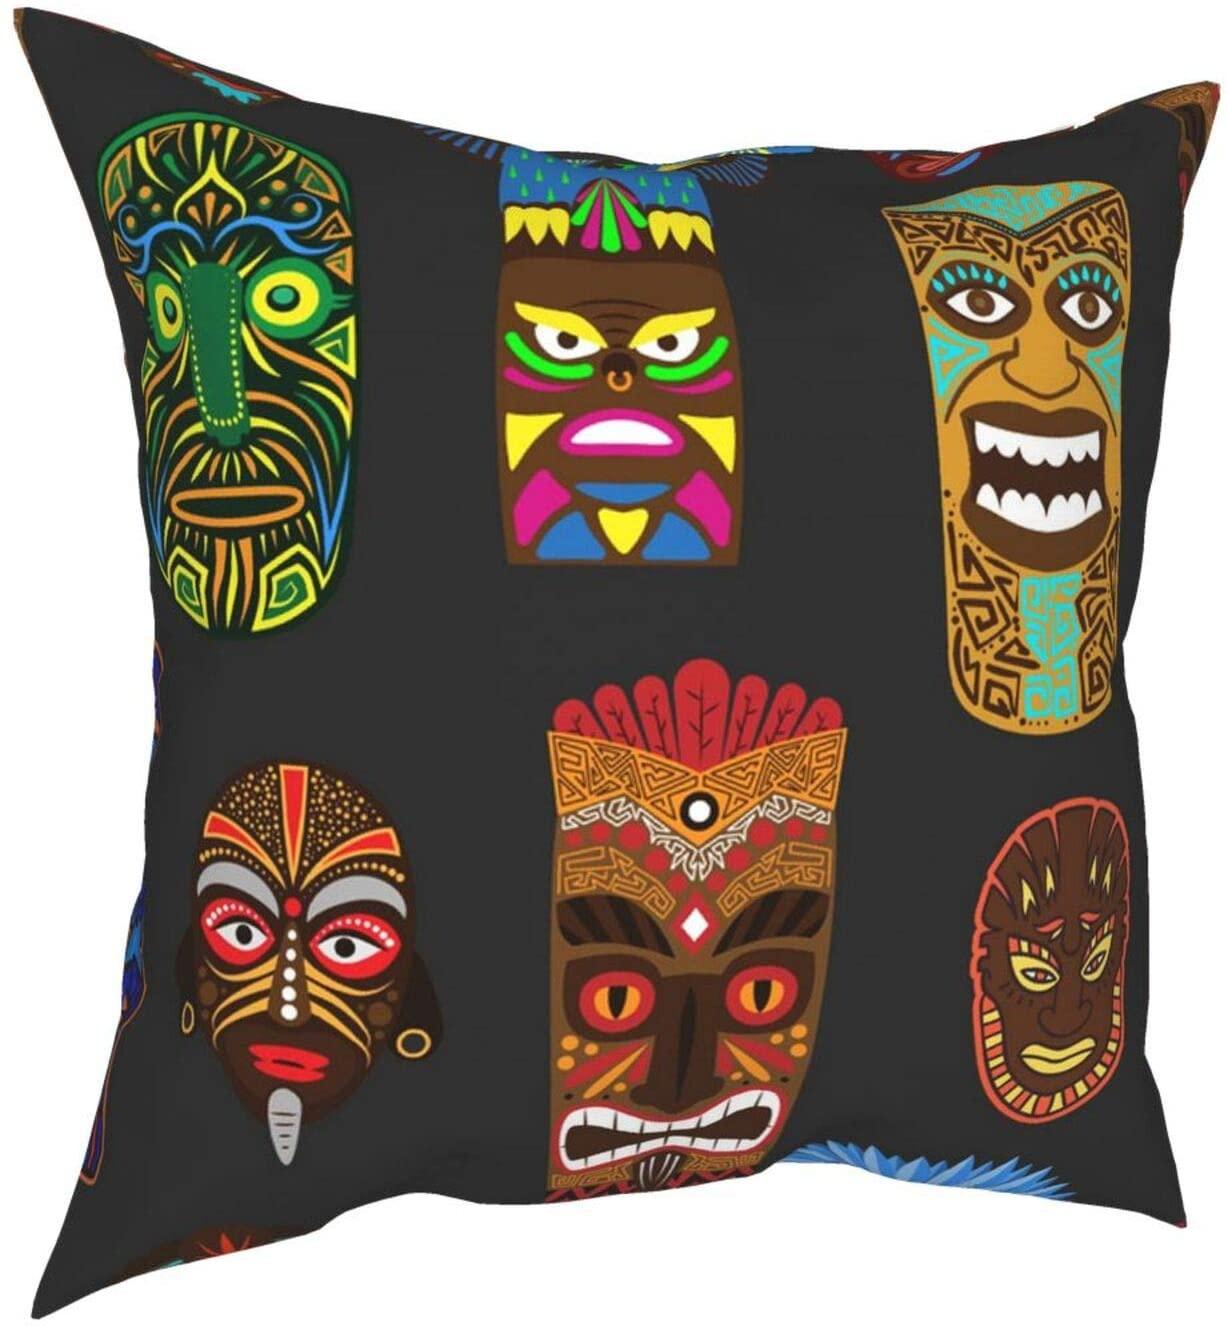 VARUN Ethnic African or Mexican Aborigen Masks Pillow Cover Decorative Throw Pillow Case Christmas Thanksgiving Farmhouse Flower Pillowcase for Home Decor Sofa Bedroom Car 12